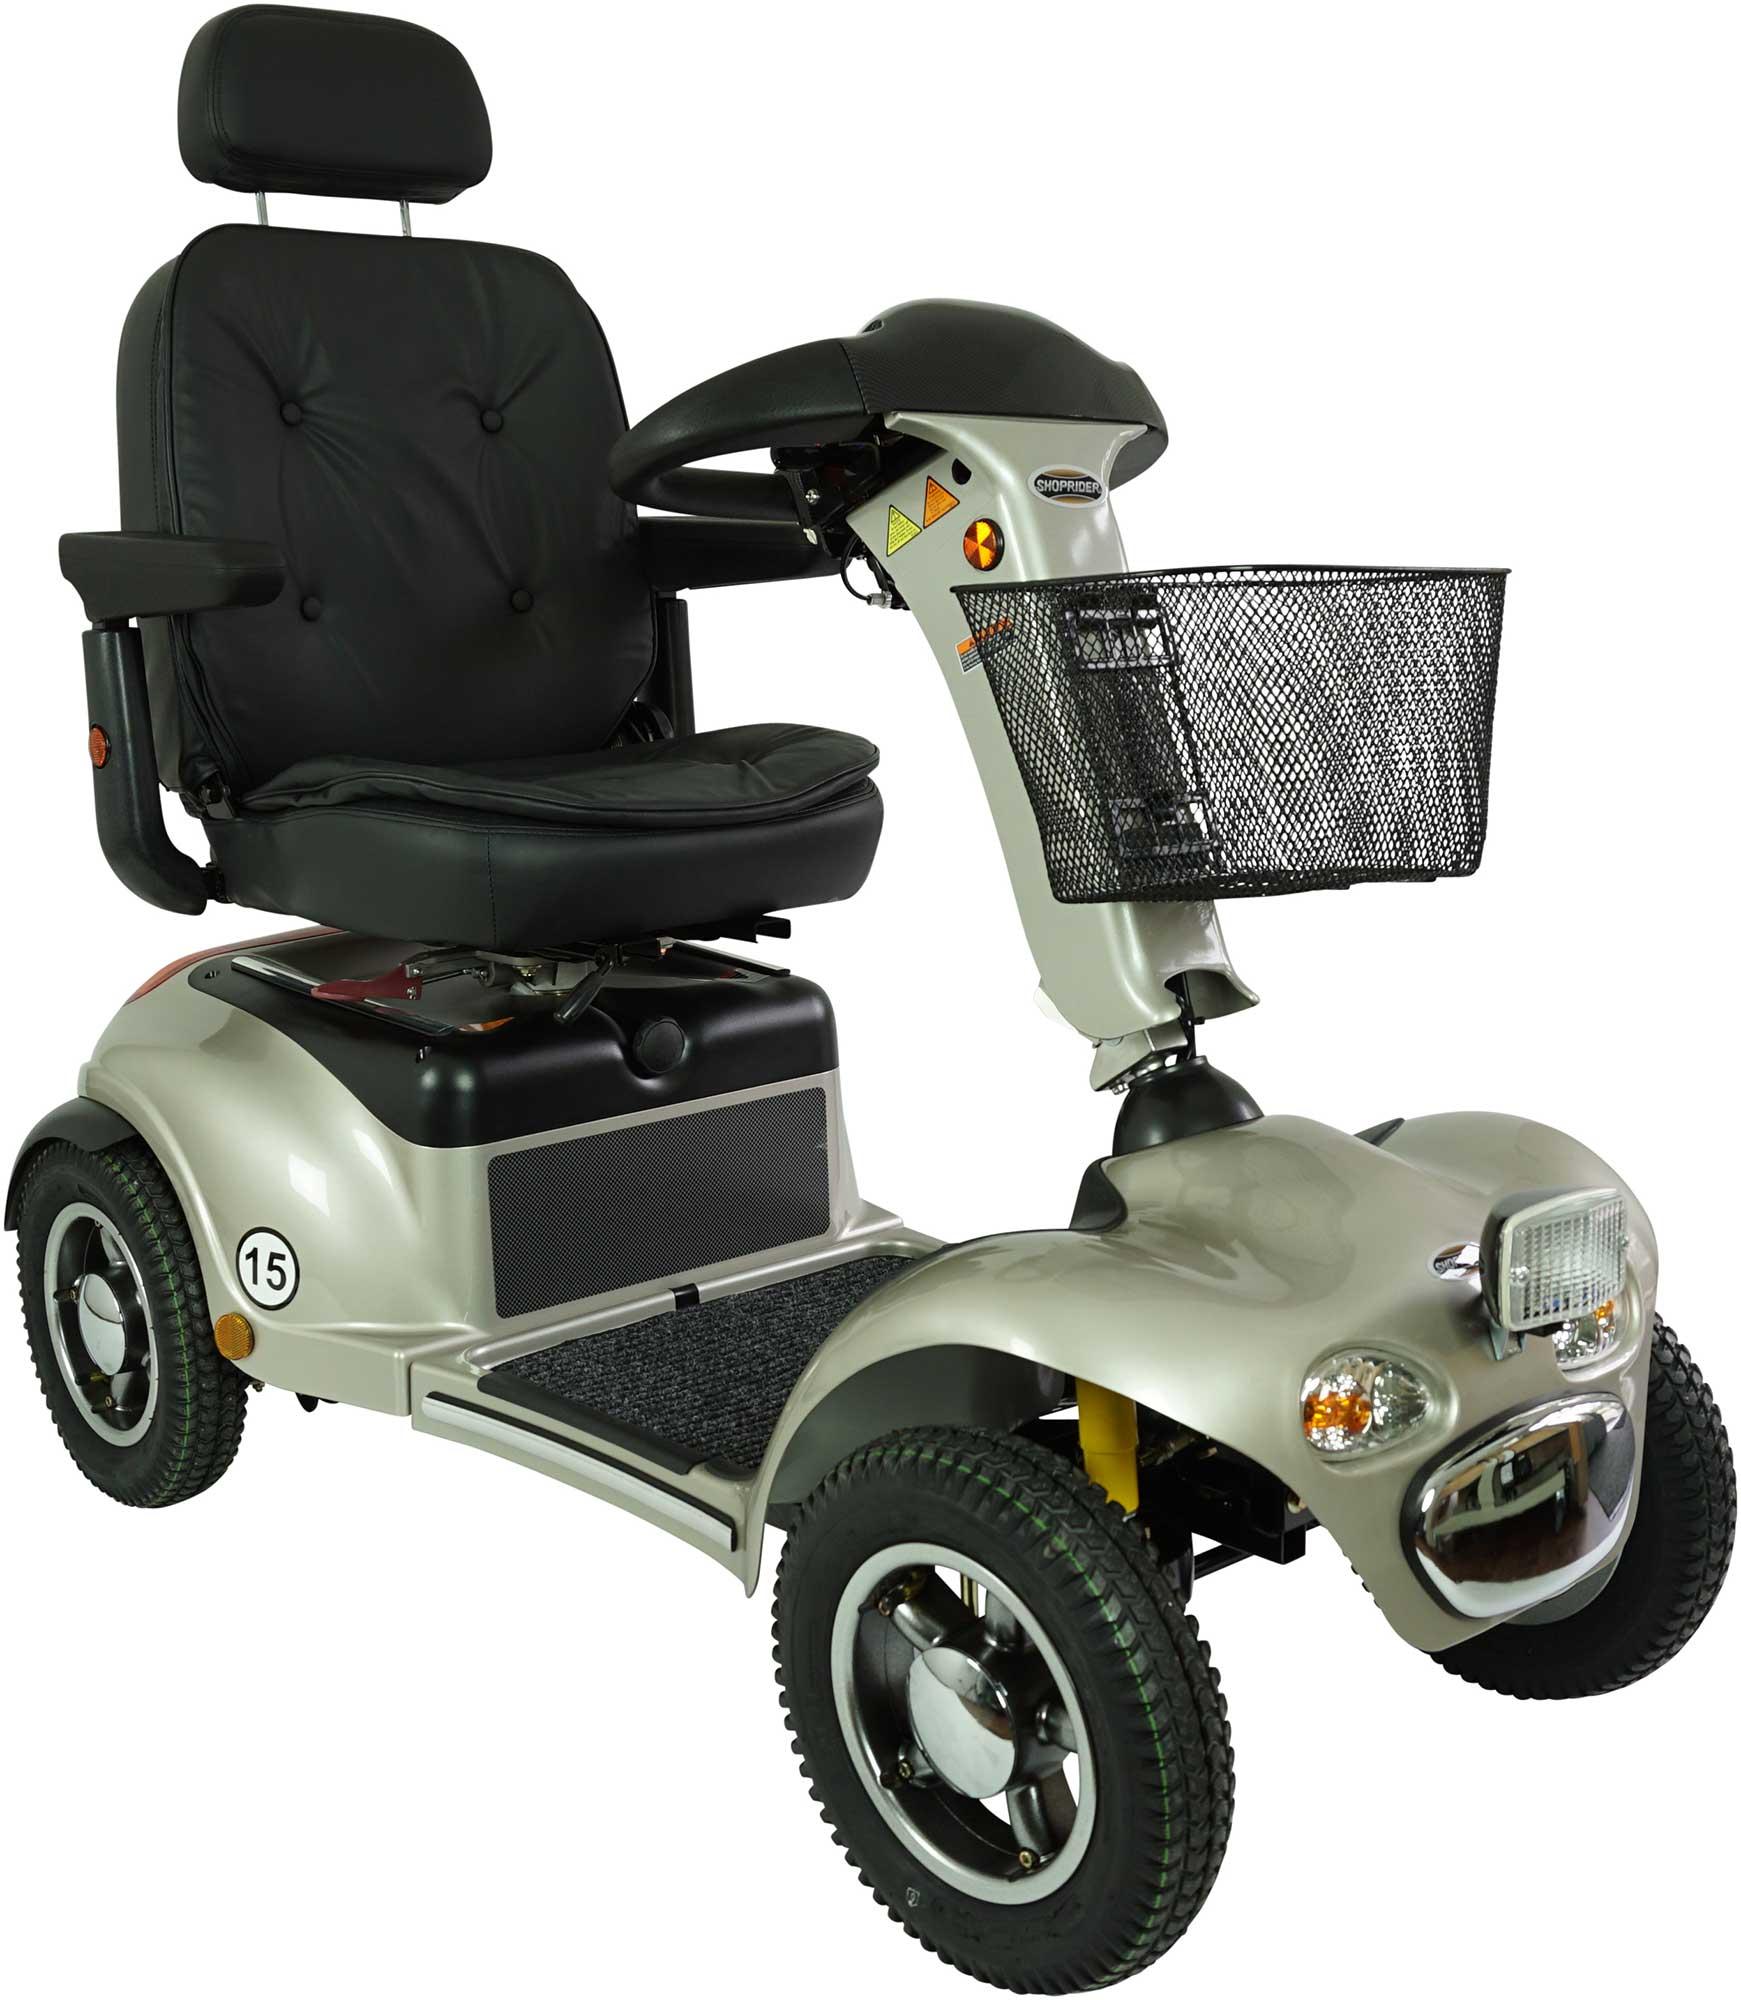 shoprider premium 15 km h elektromobil mc seniorenprodukte. Black Bedroom Furniture Sets. Home Design Ideas